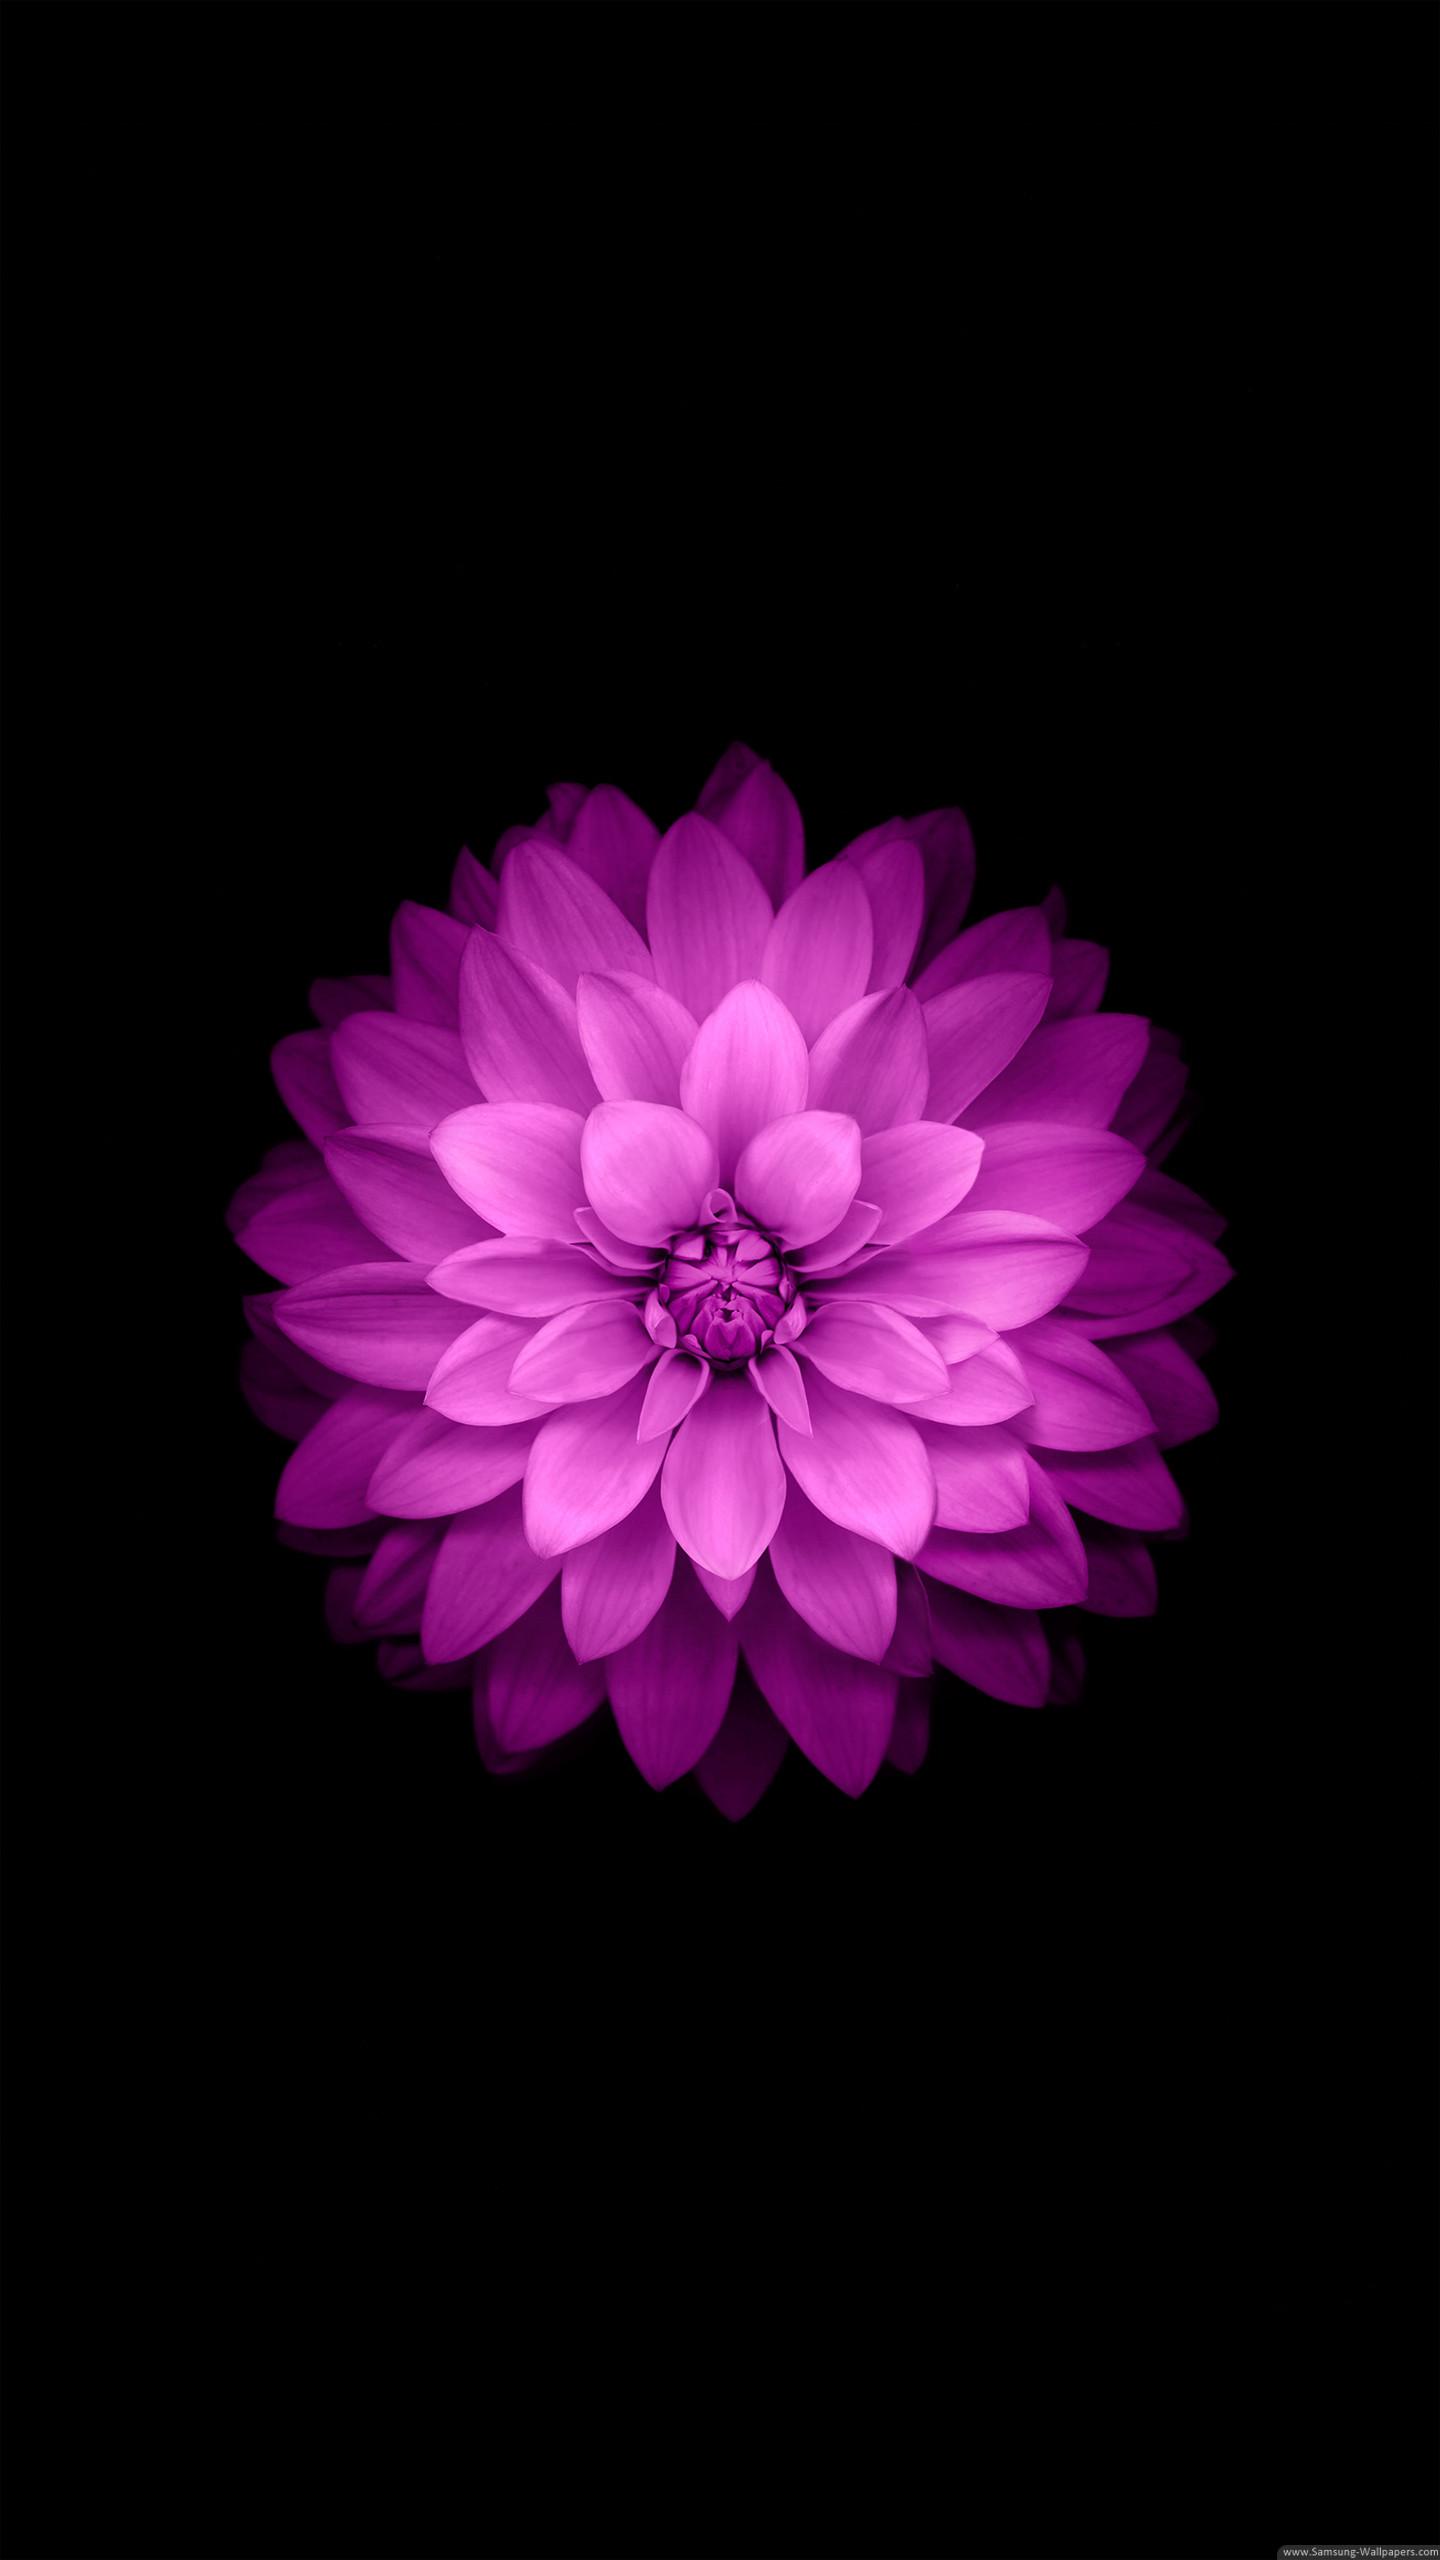 Iphone6 Plus Official Lock Screen Samsung Galaxy S6 Flower Wallpaper Iphone 1440x2560 Wallpaper Teahub Io